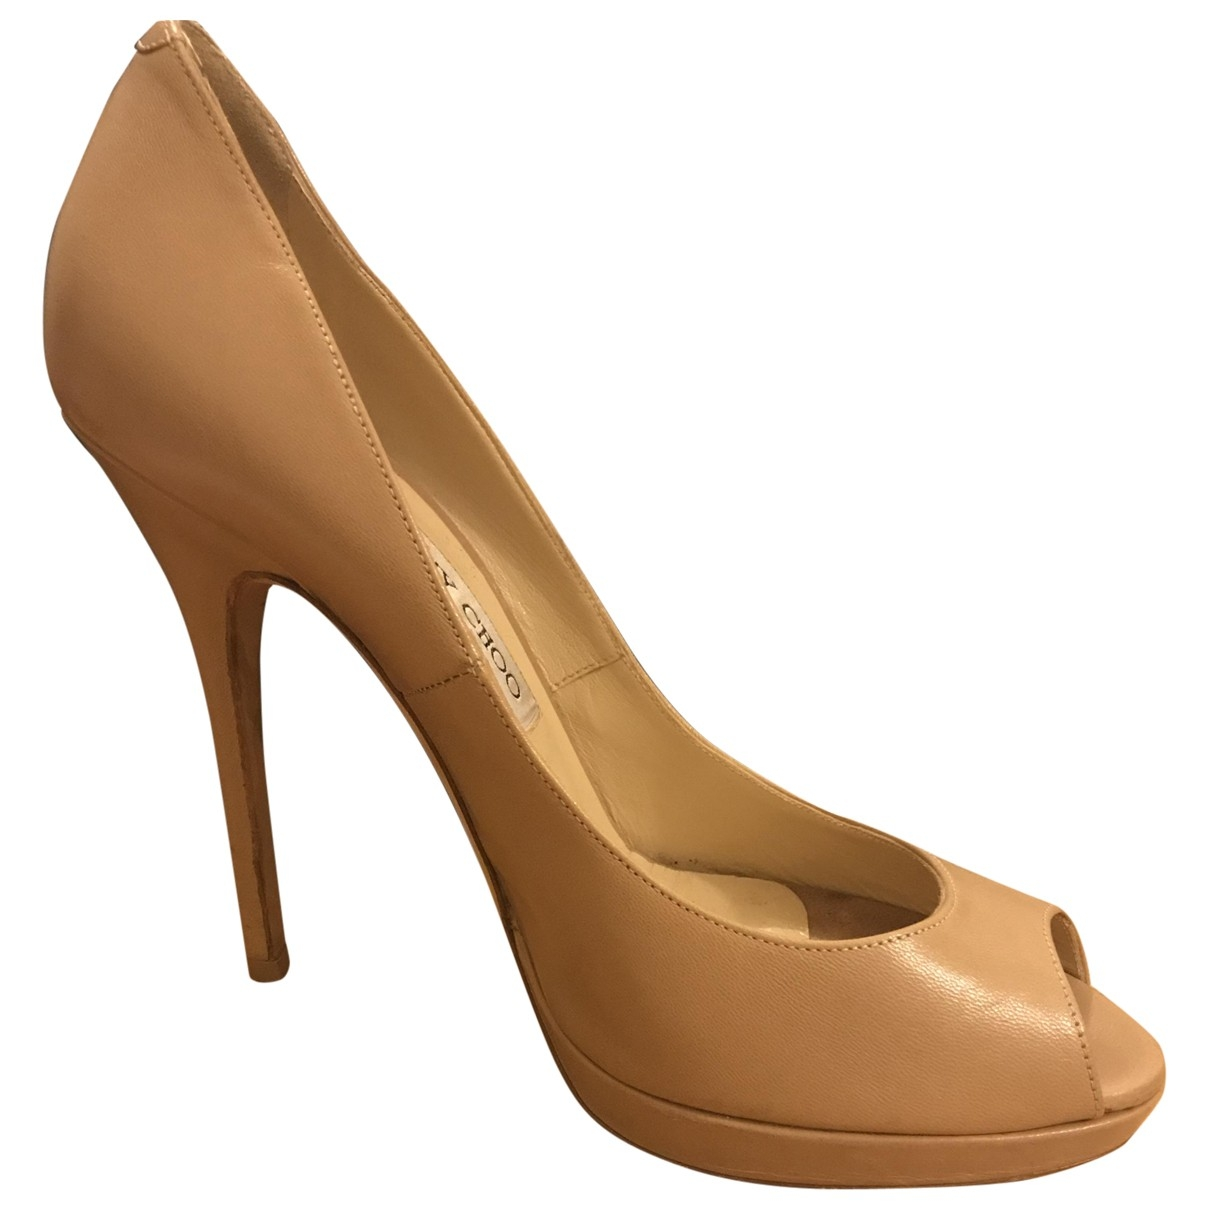 Jimmy Choo \N Beige Leather Heels for Women 38 EU